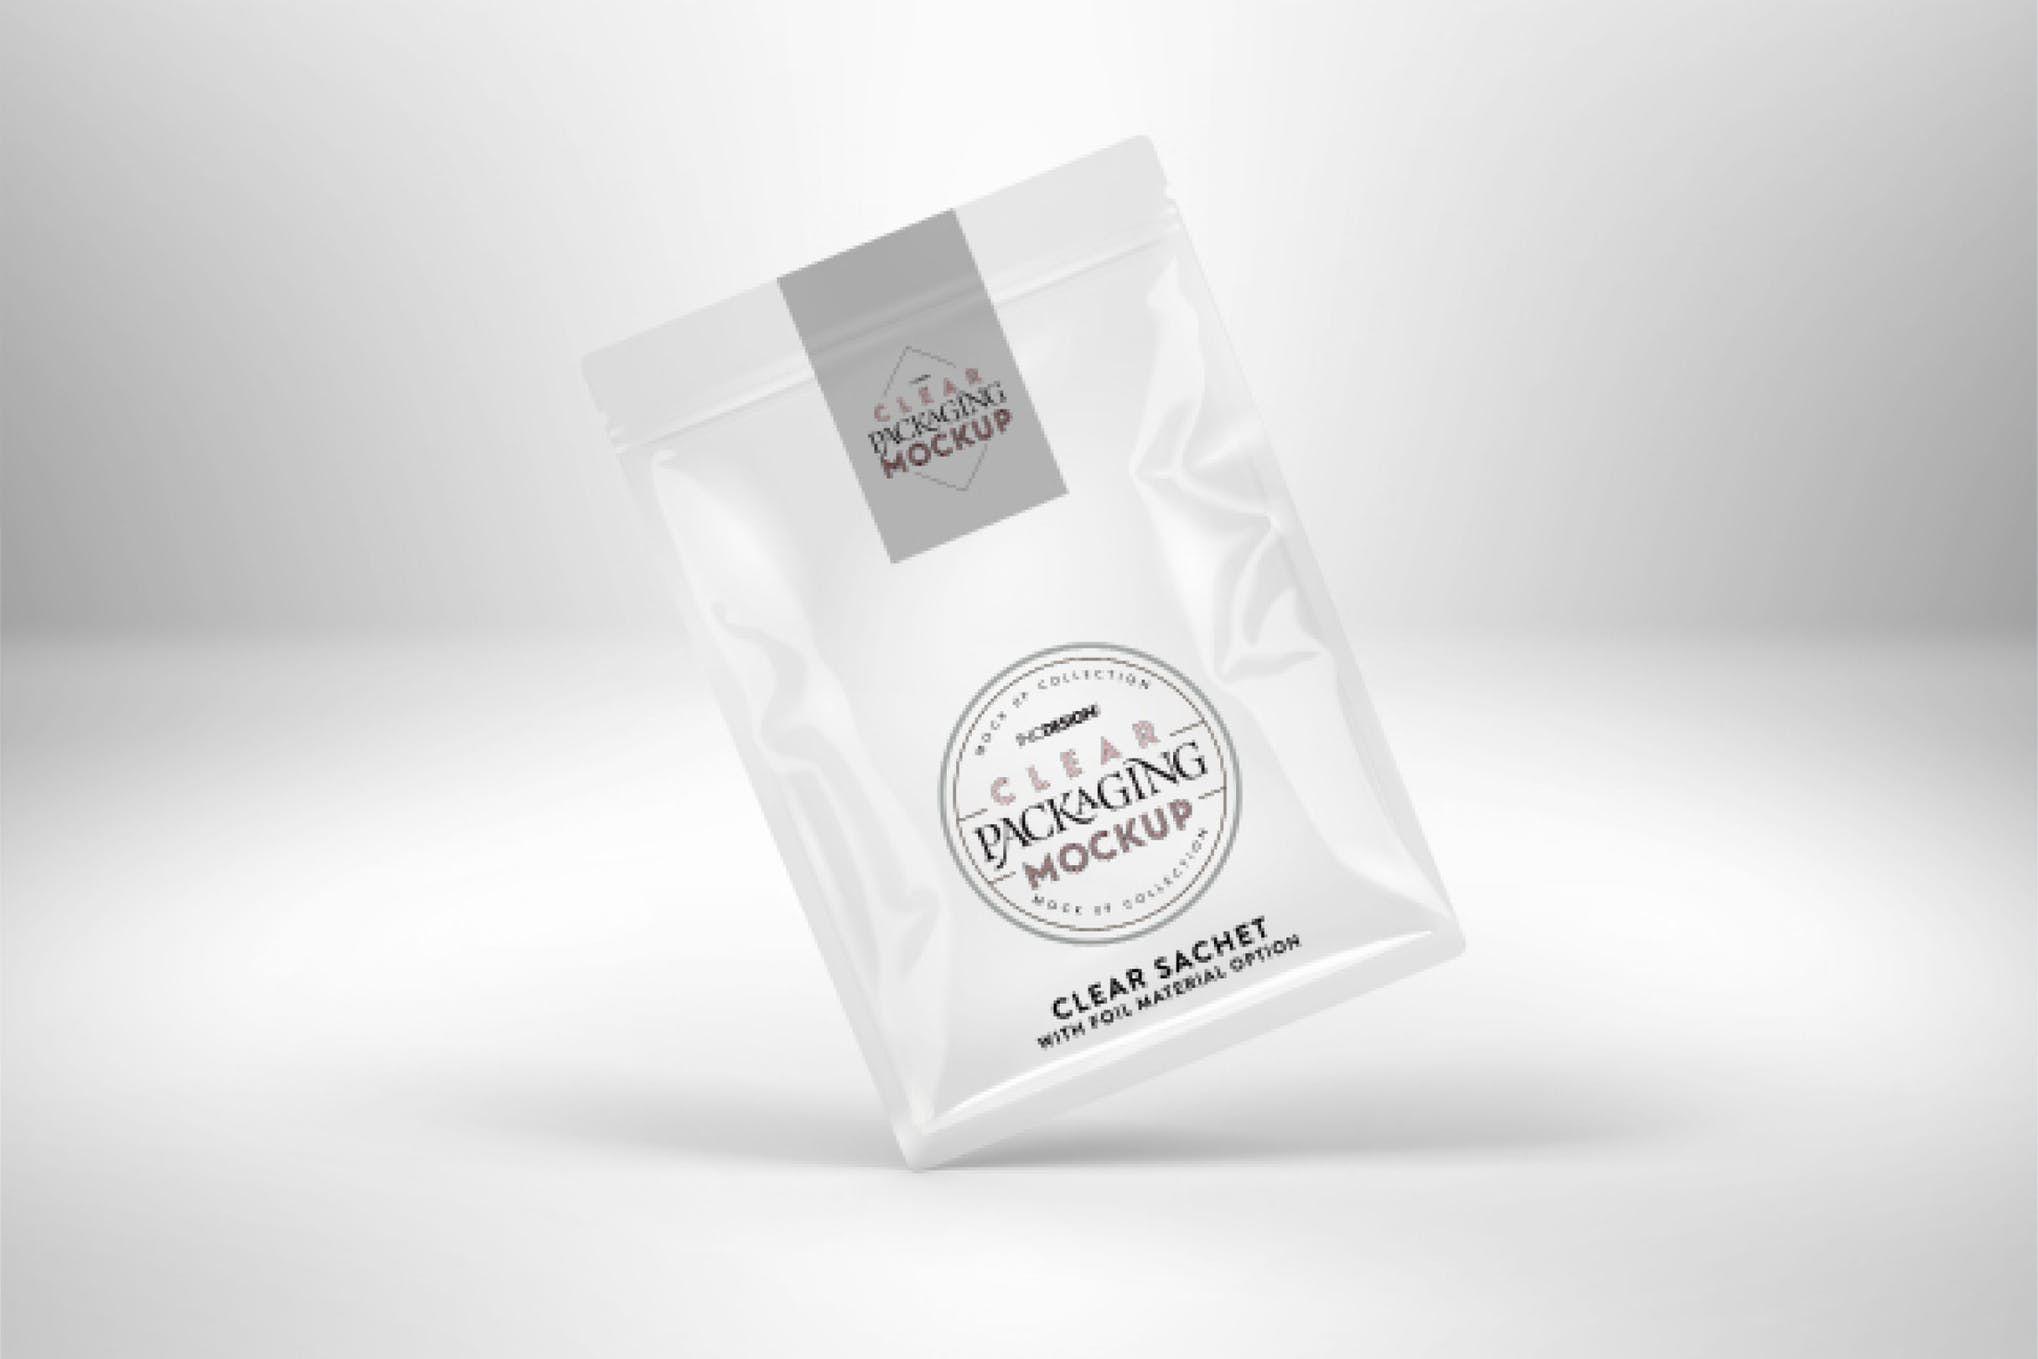 Download Clear Foil Sachet Packaging Mockup By Ina717 On Envato Elements Packaging Mockup Foil Packaging Sachet